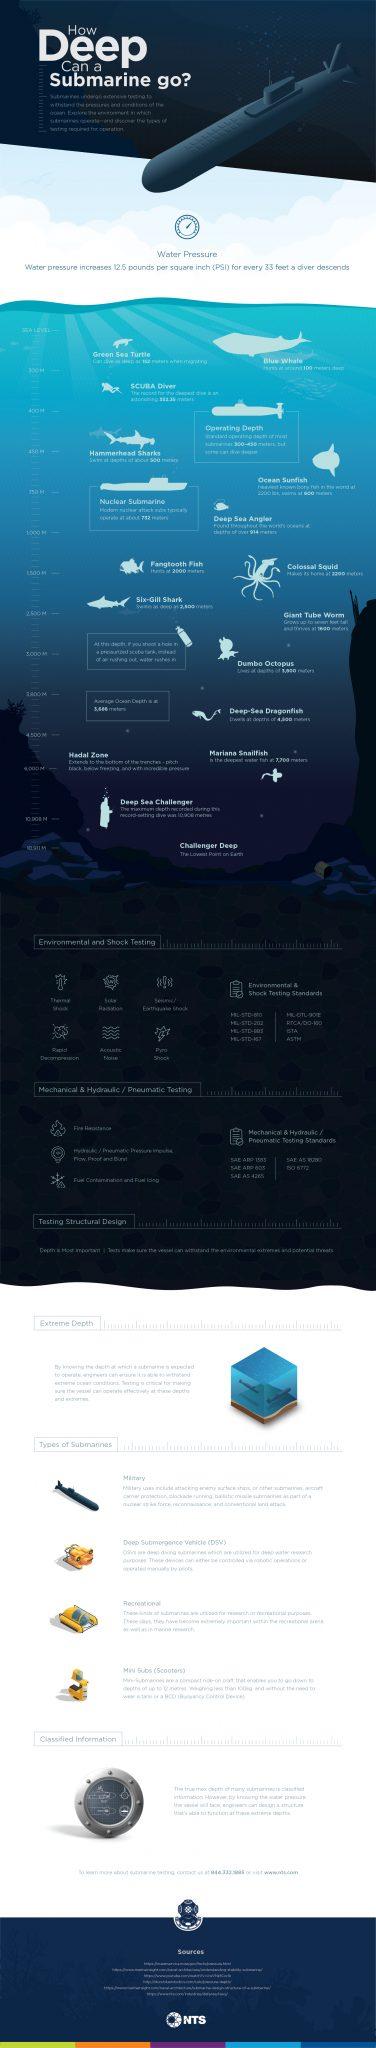 Submarine-Infographic-06-01